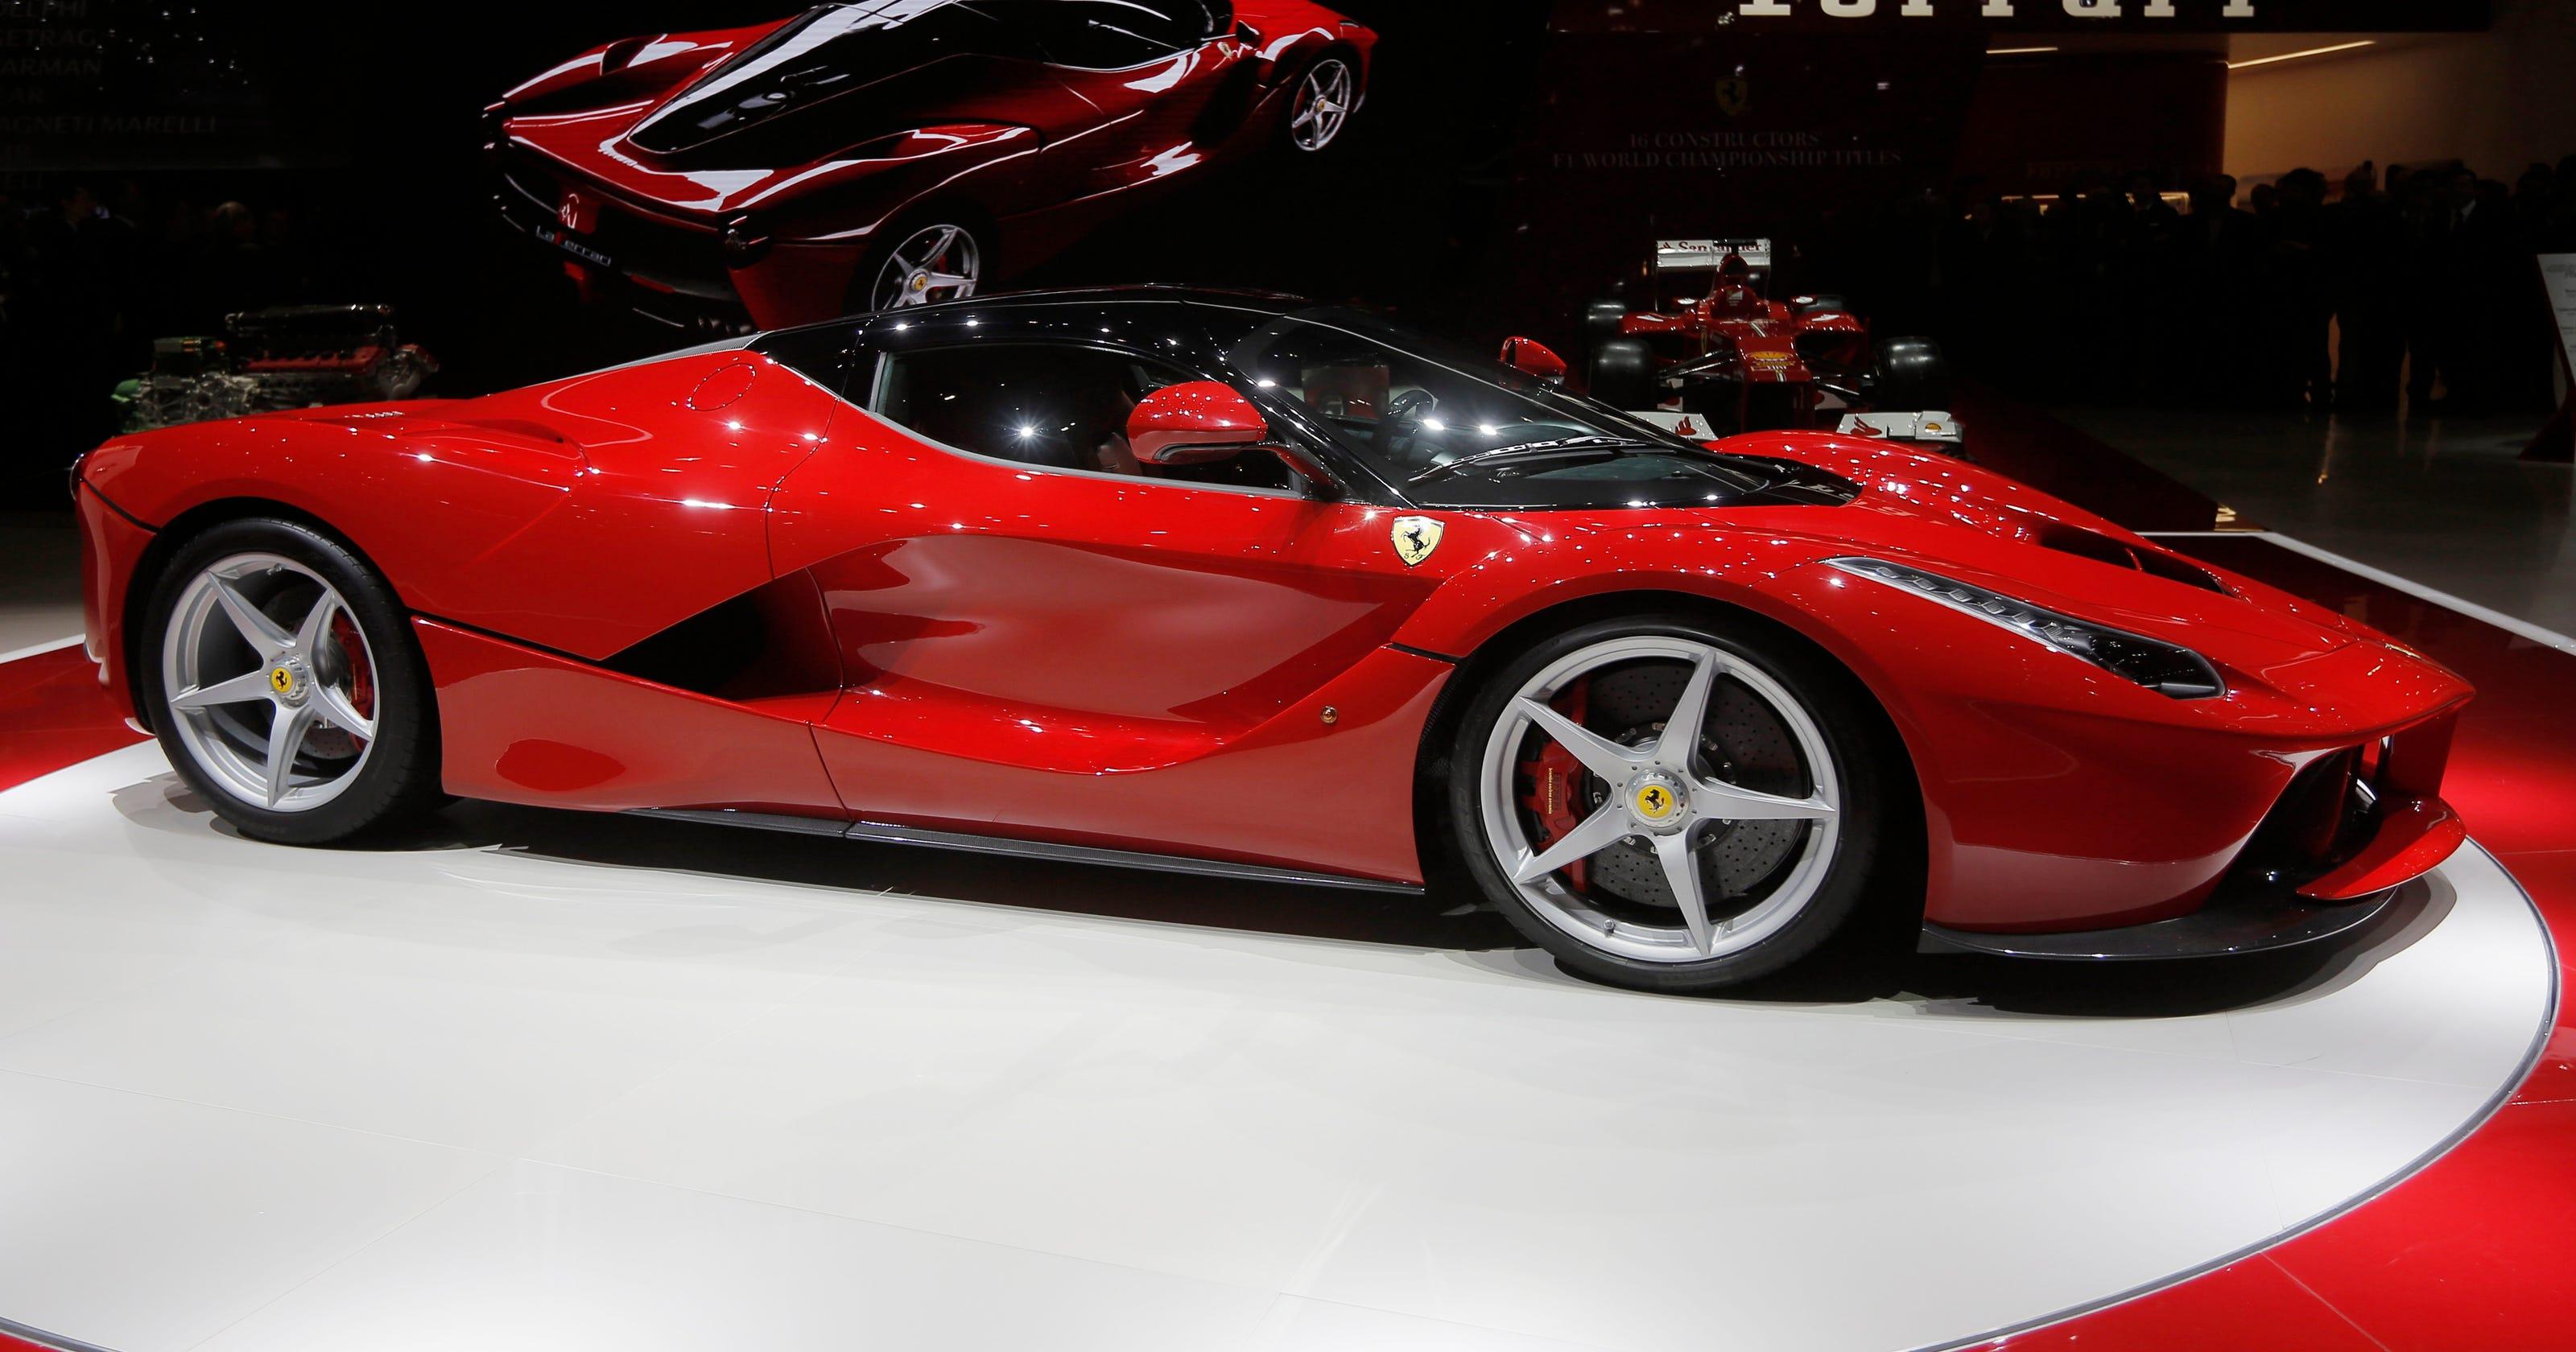 Permalink to How To Get A Job At Ferrari Dealership